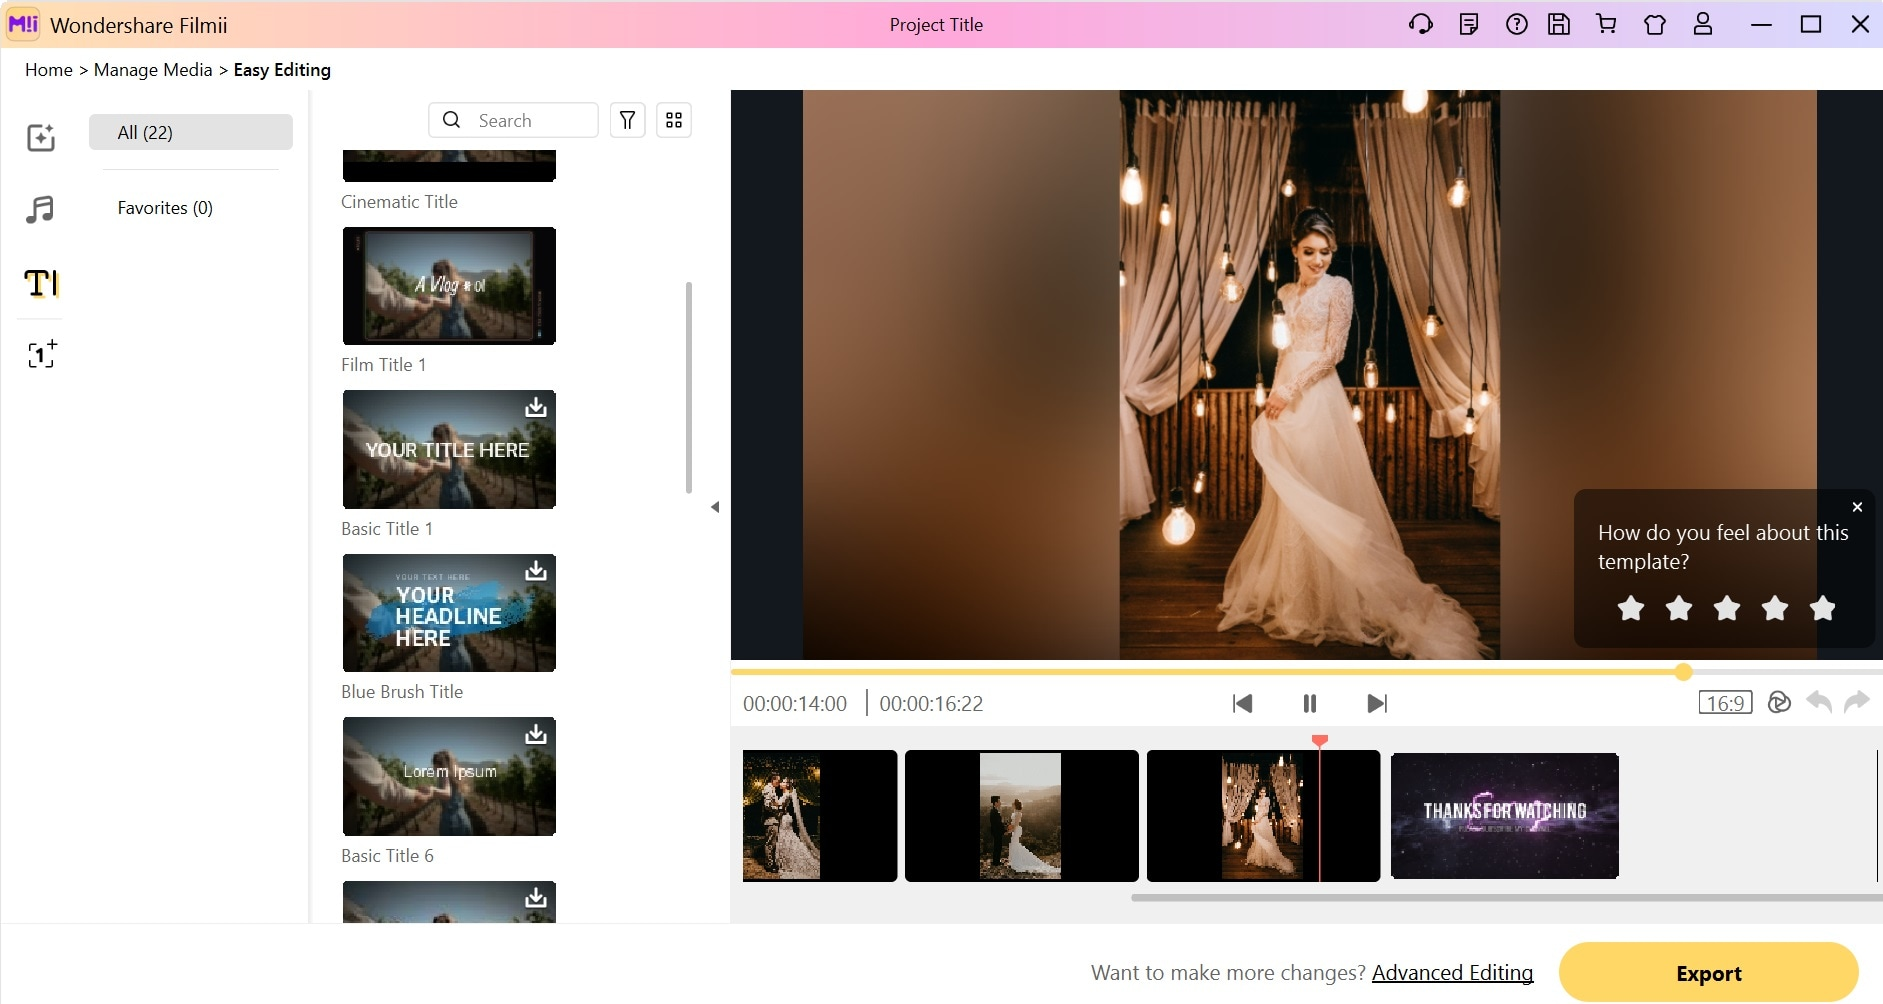 wedding slideshow filmii